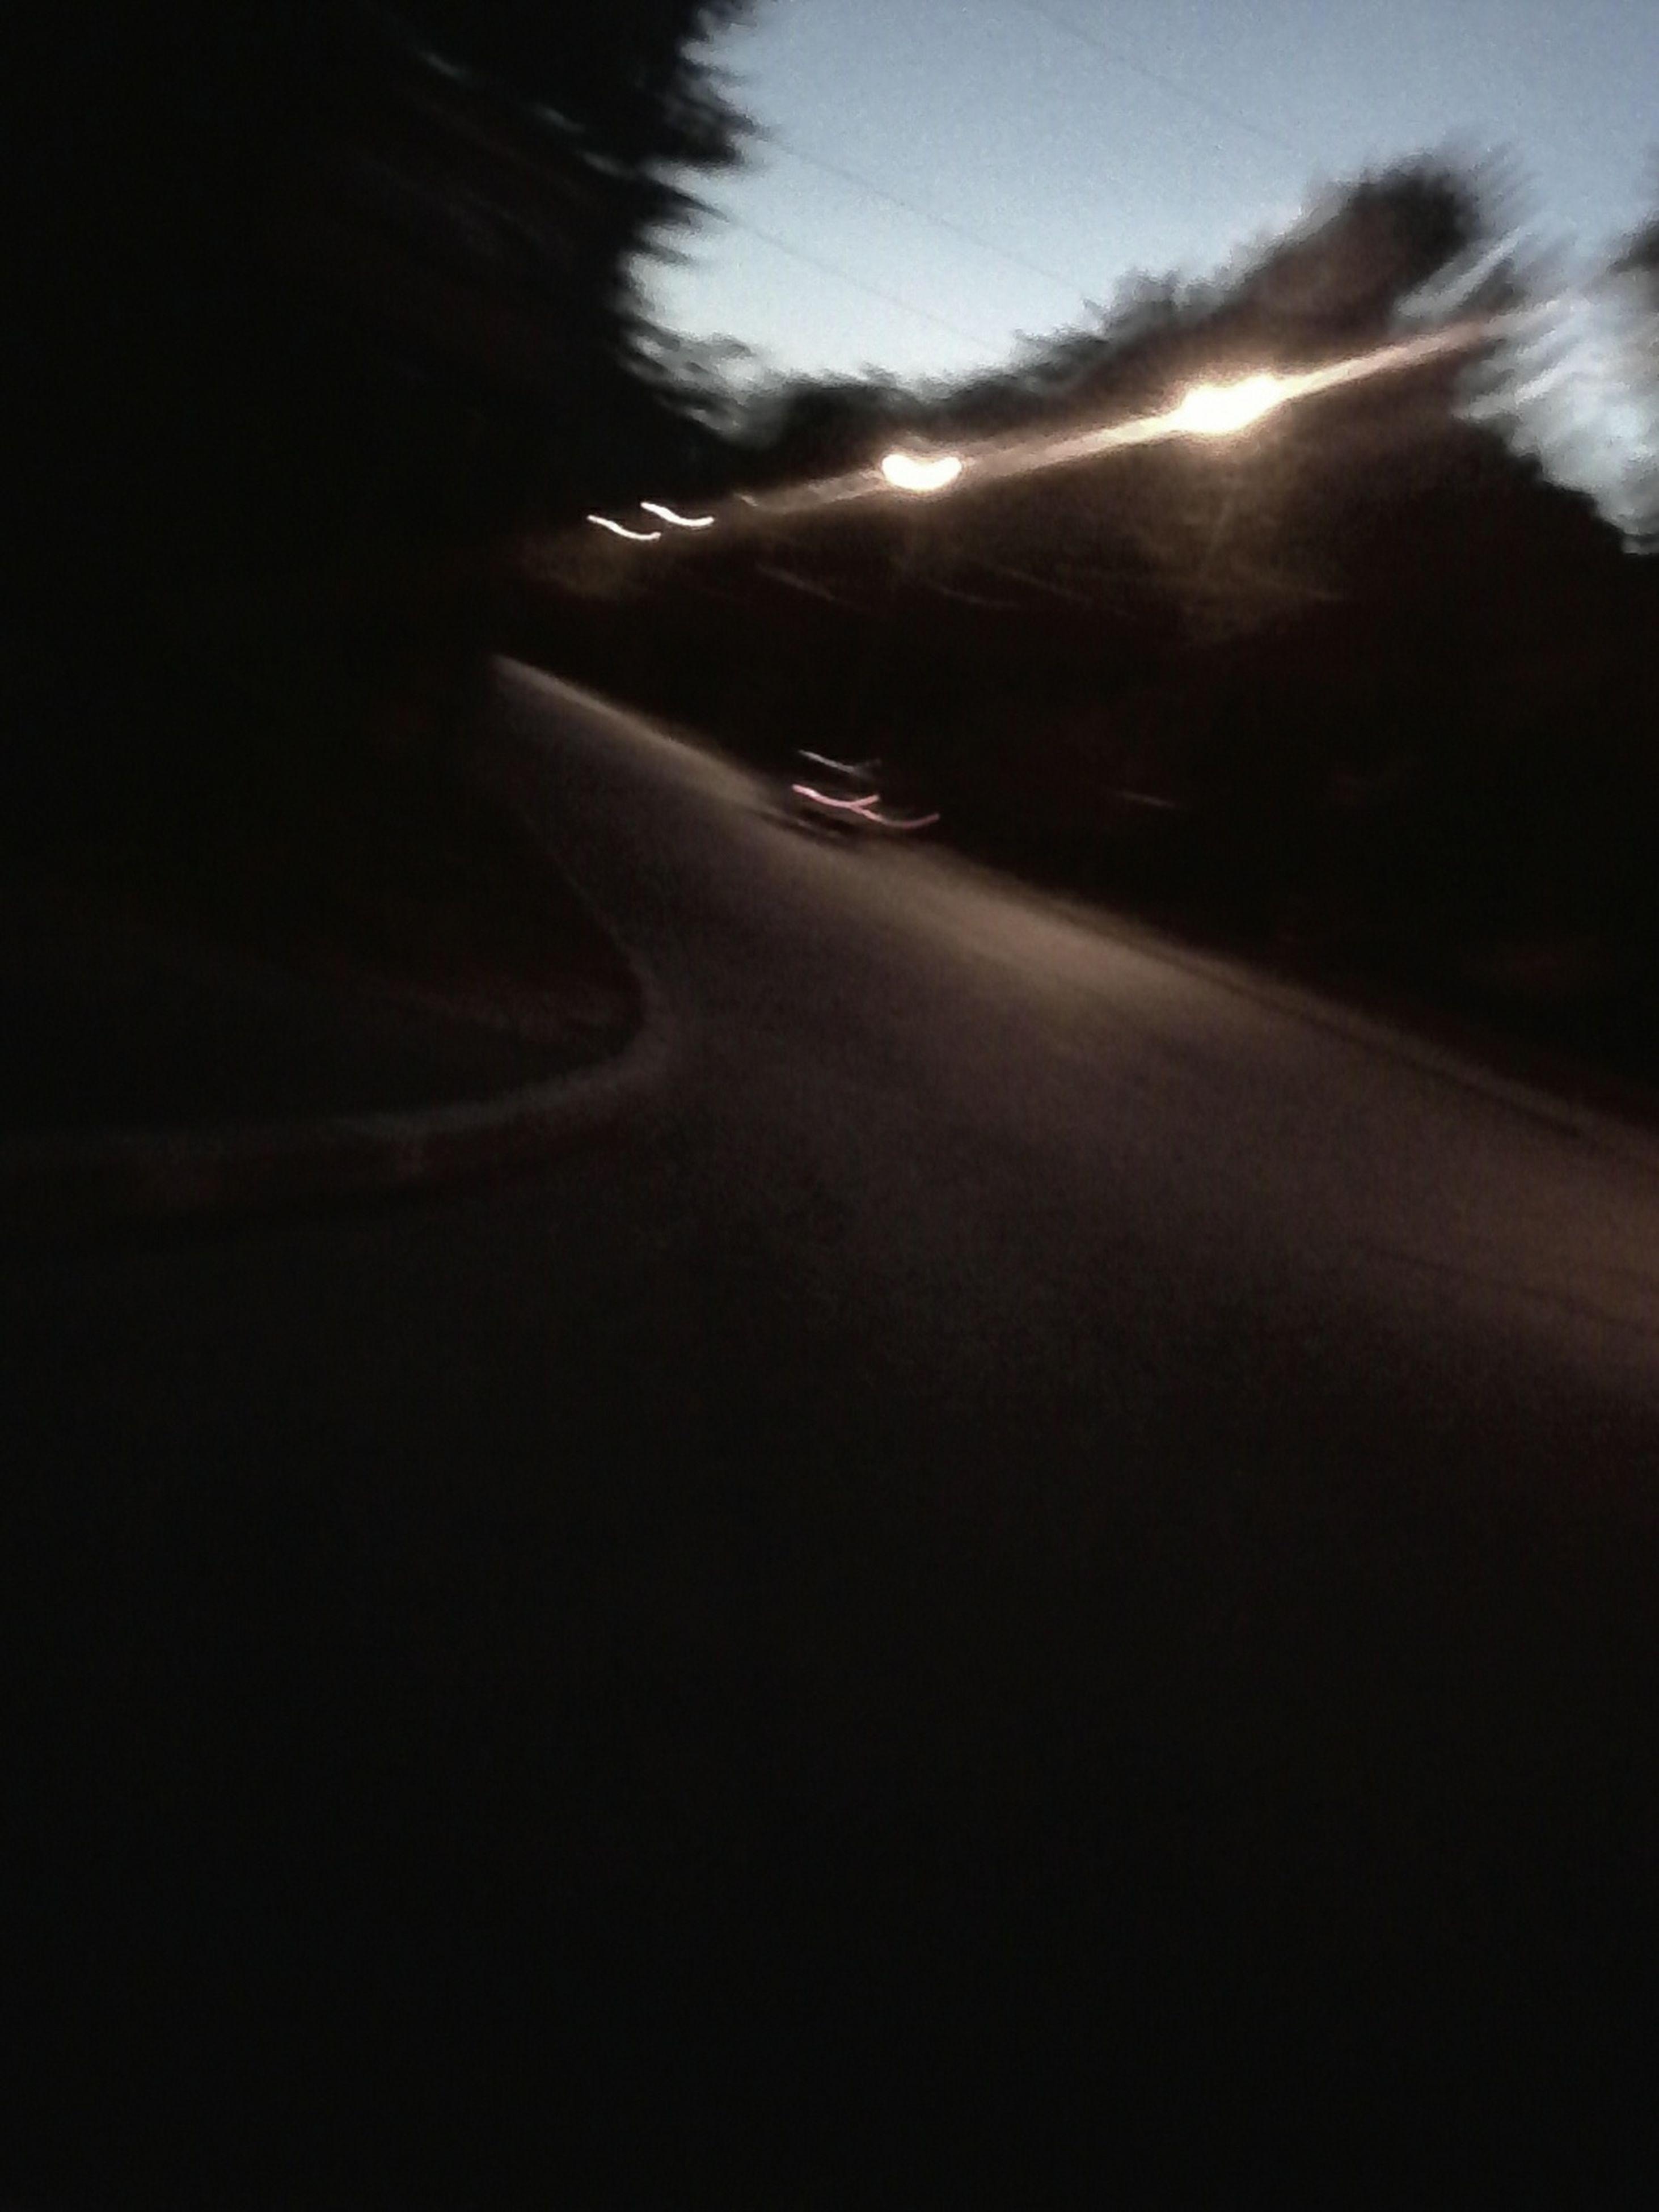 transportation, road, the way forward, street, car, road marking, night, illuminated, mode of transport, land vehicle, diminishing perspective, vanishing point, sky, street light, asphalt, silhouette, outdoors, on the move, no people, dusk